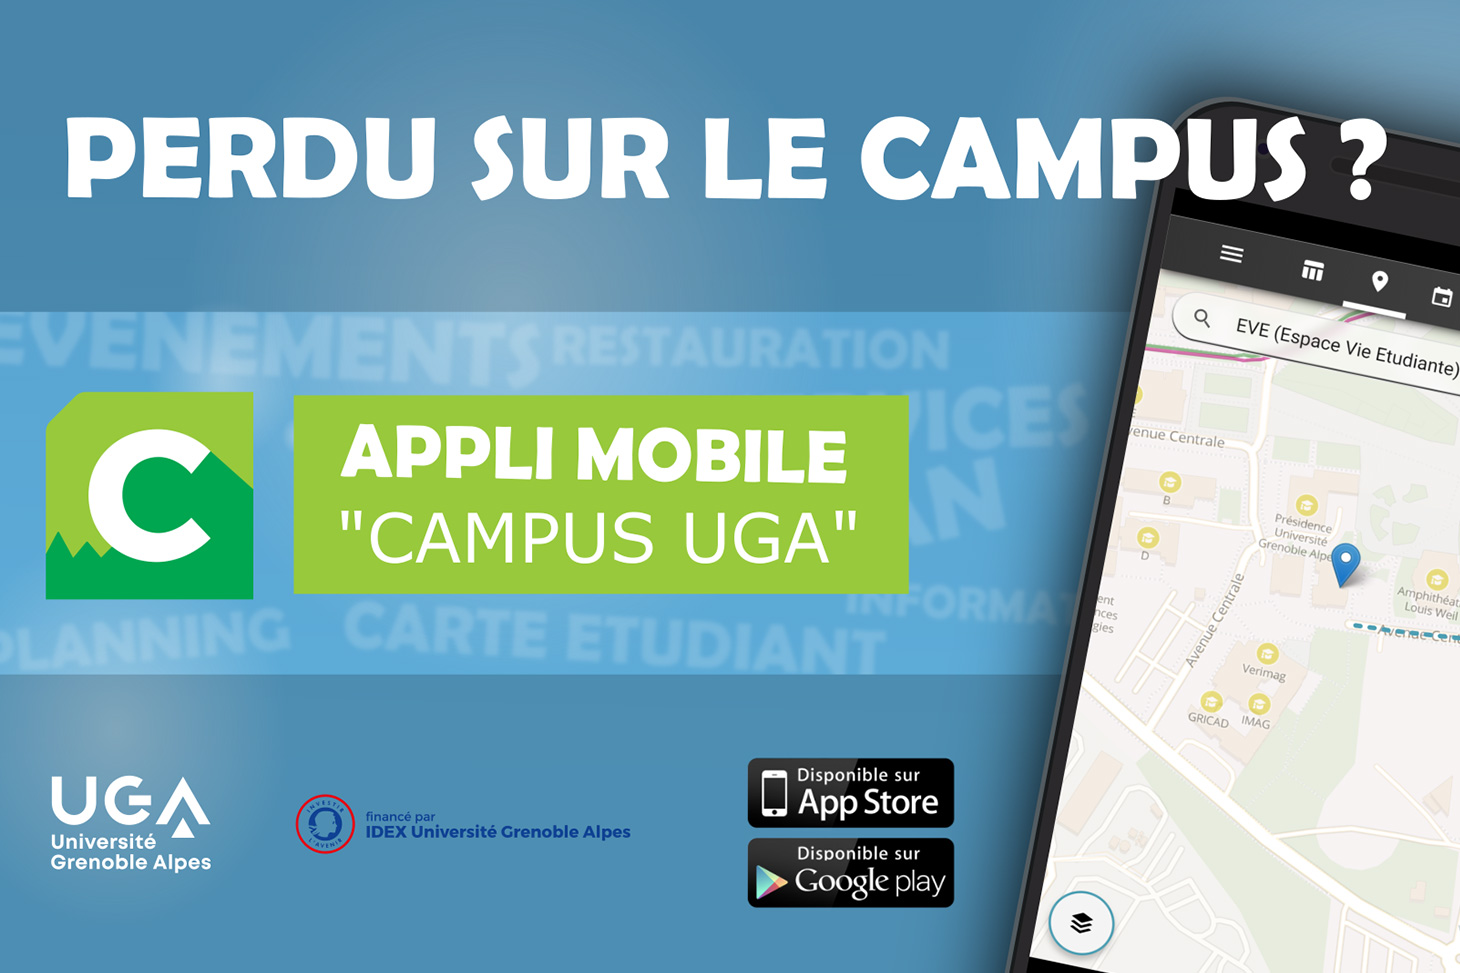 L'application mobile Campus UGA